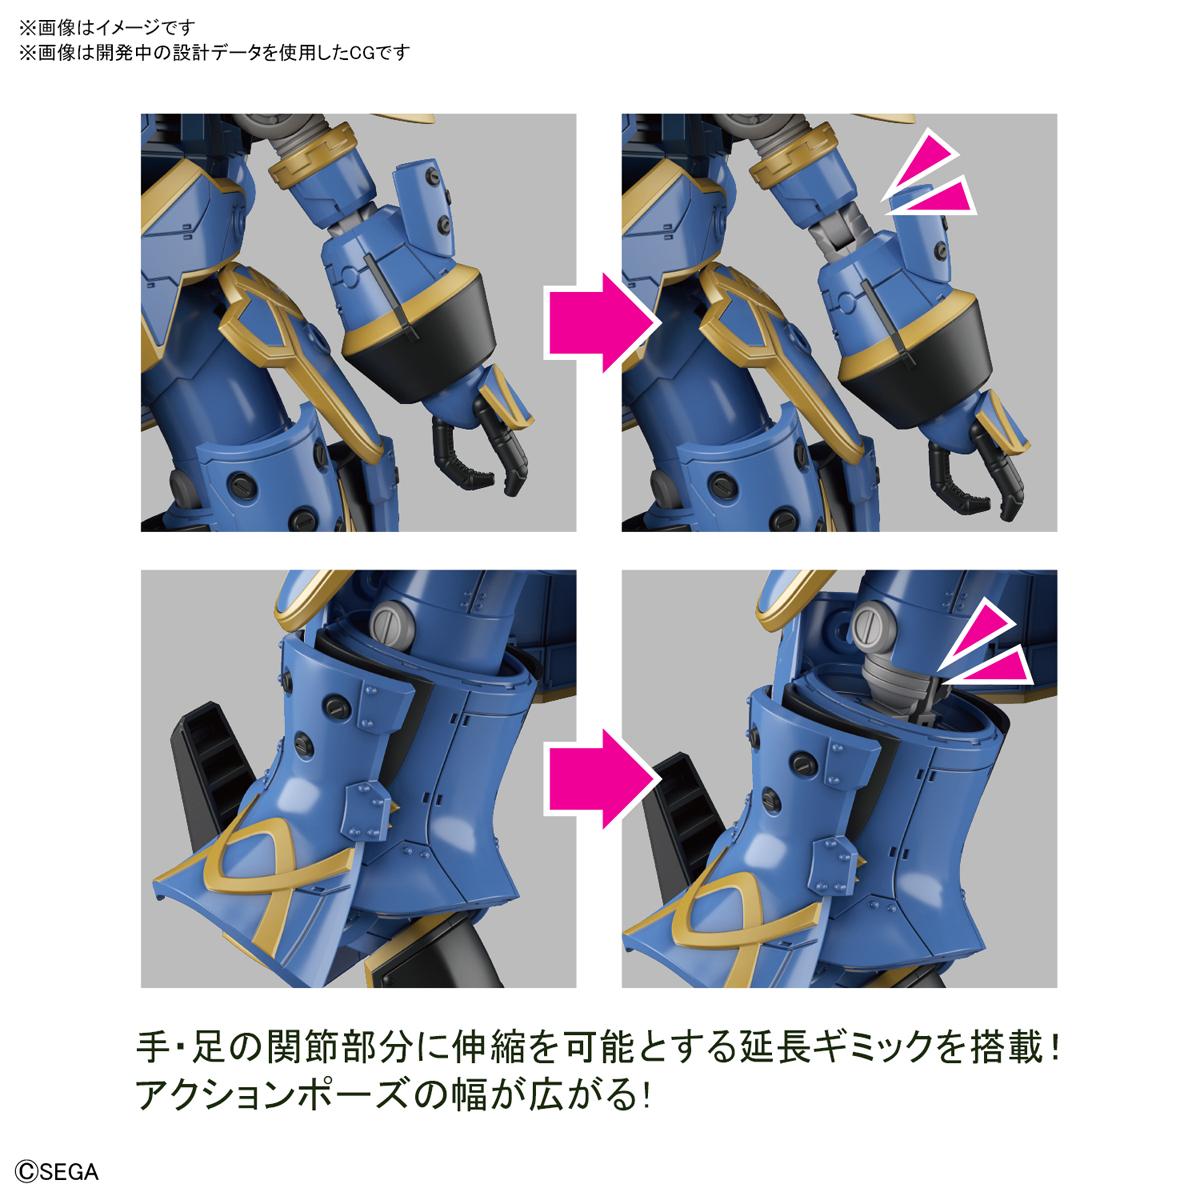 HG 1/24『霊子戦闘機・無限(アナスタシア・パルマ機)』新サクラ大戦 プラモデル-004